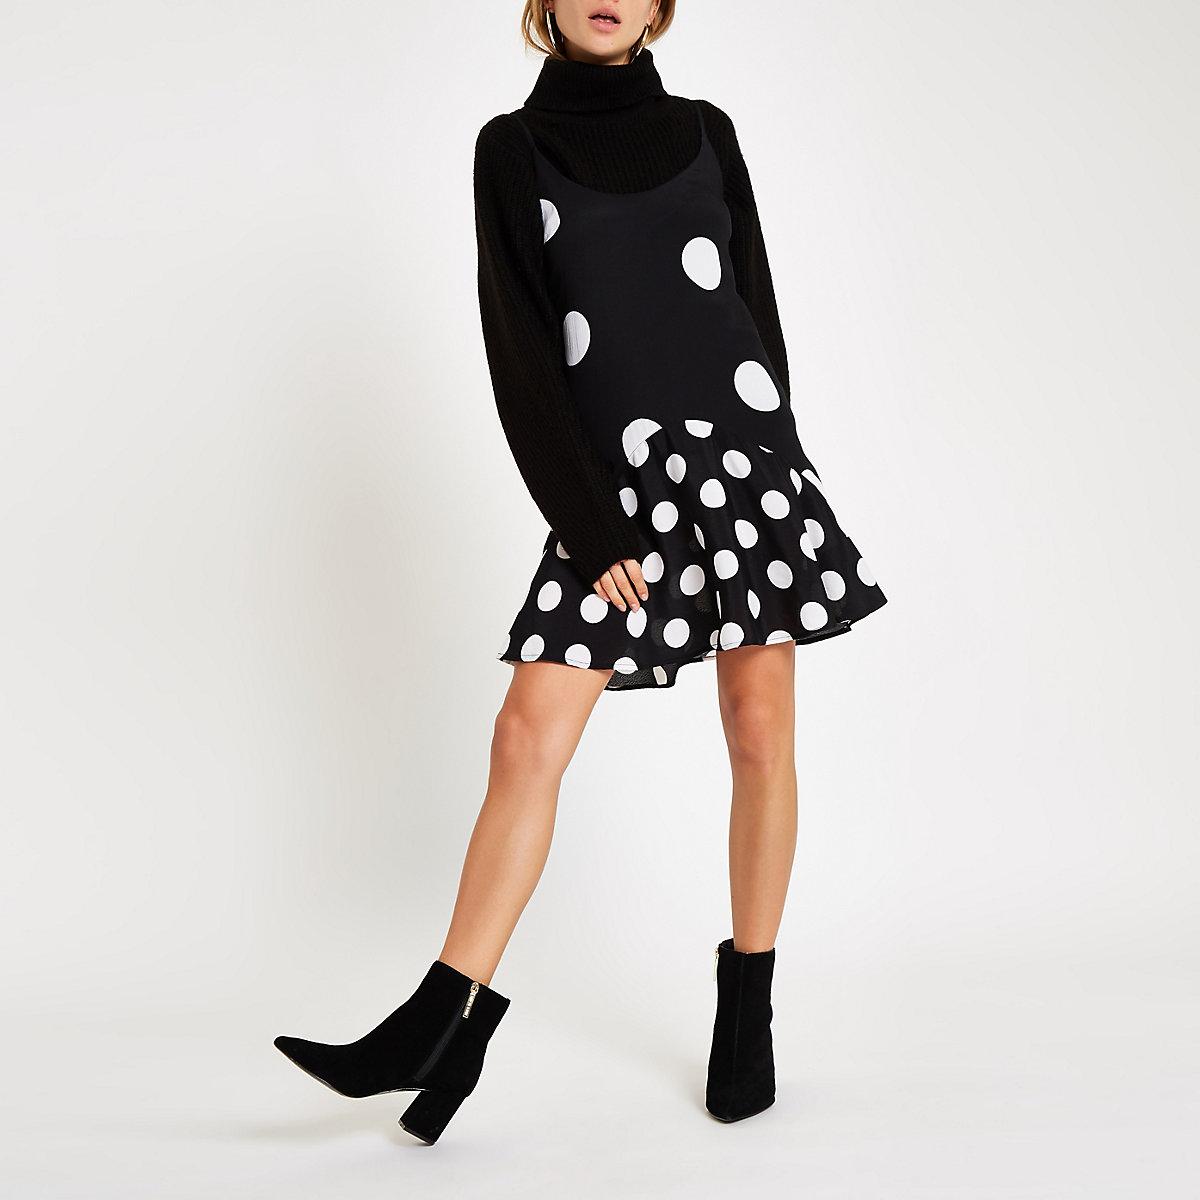 Black polka dot frill hem slip dress